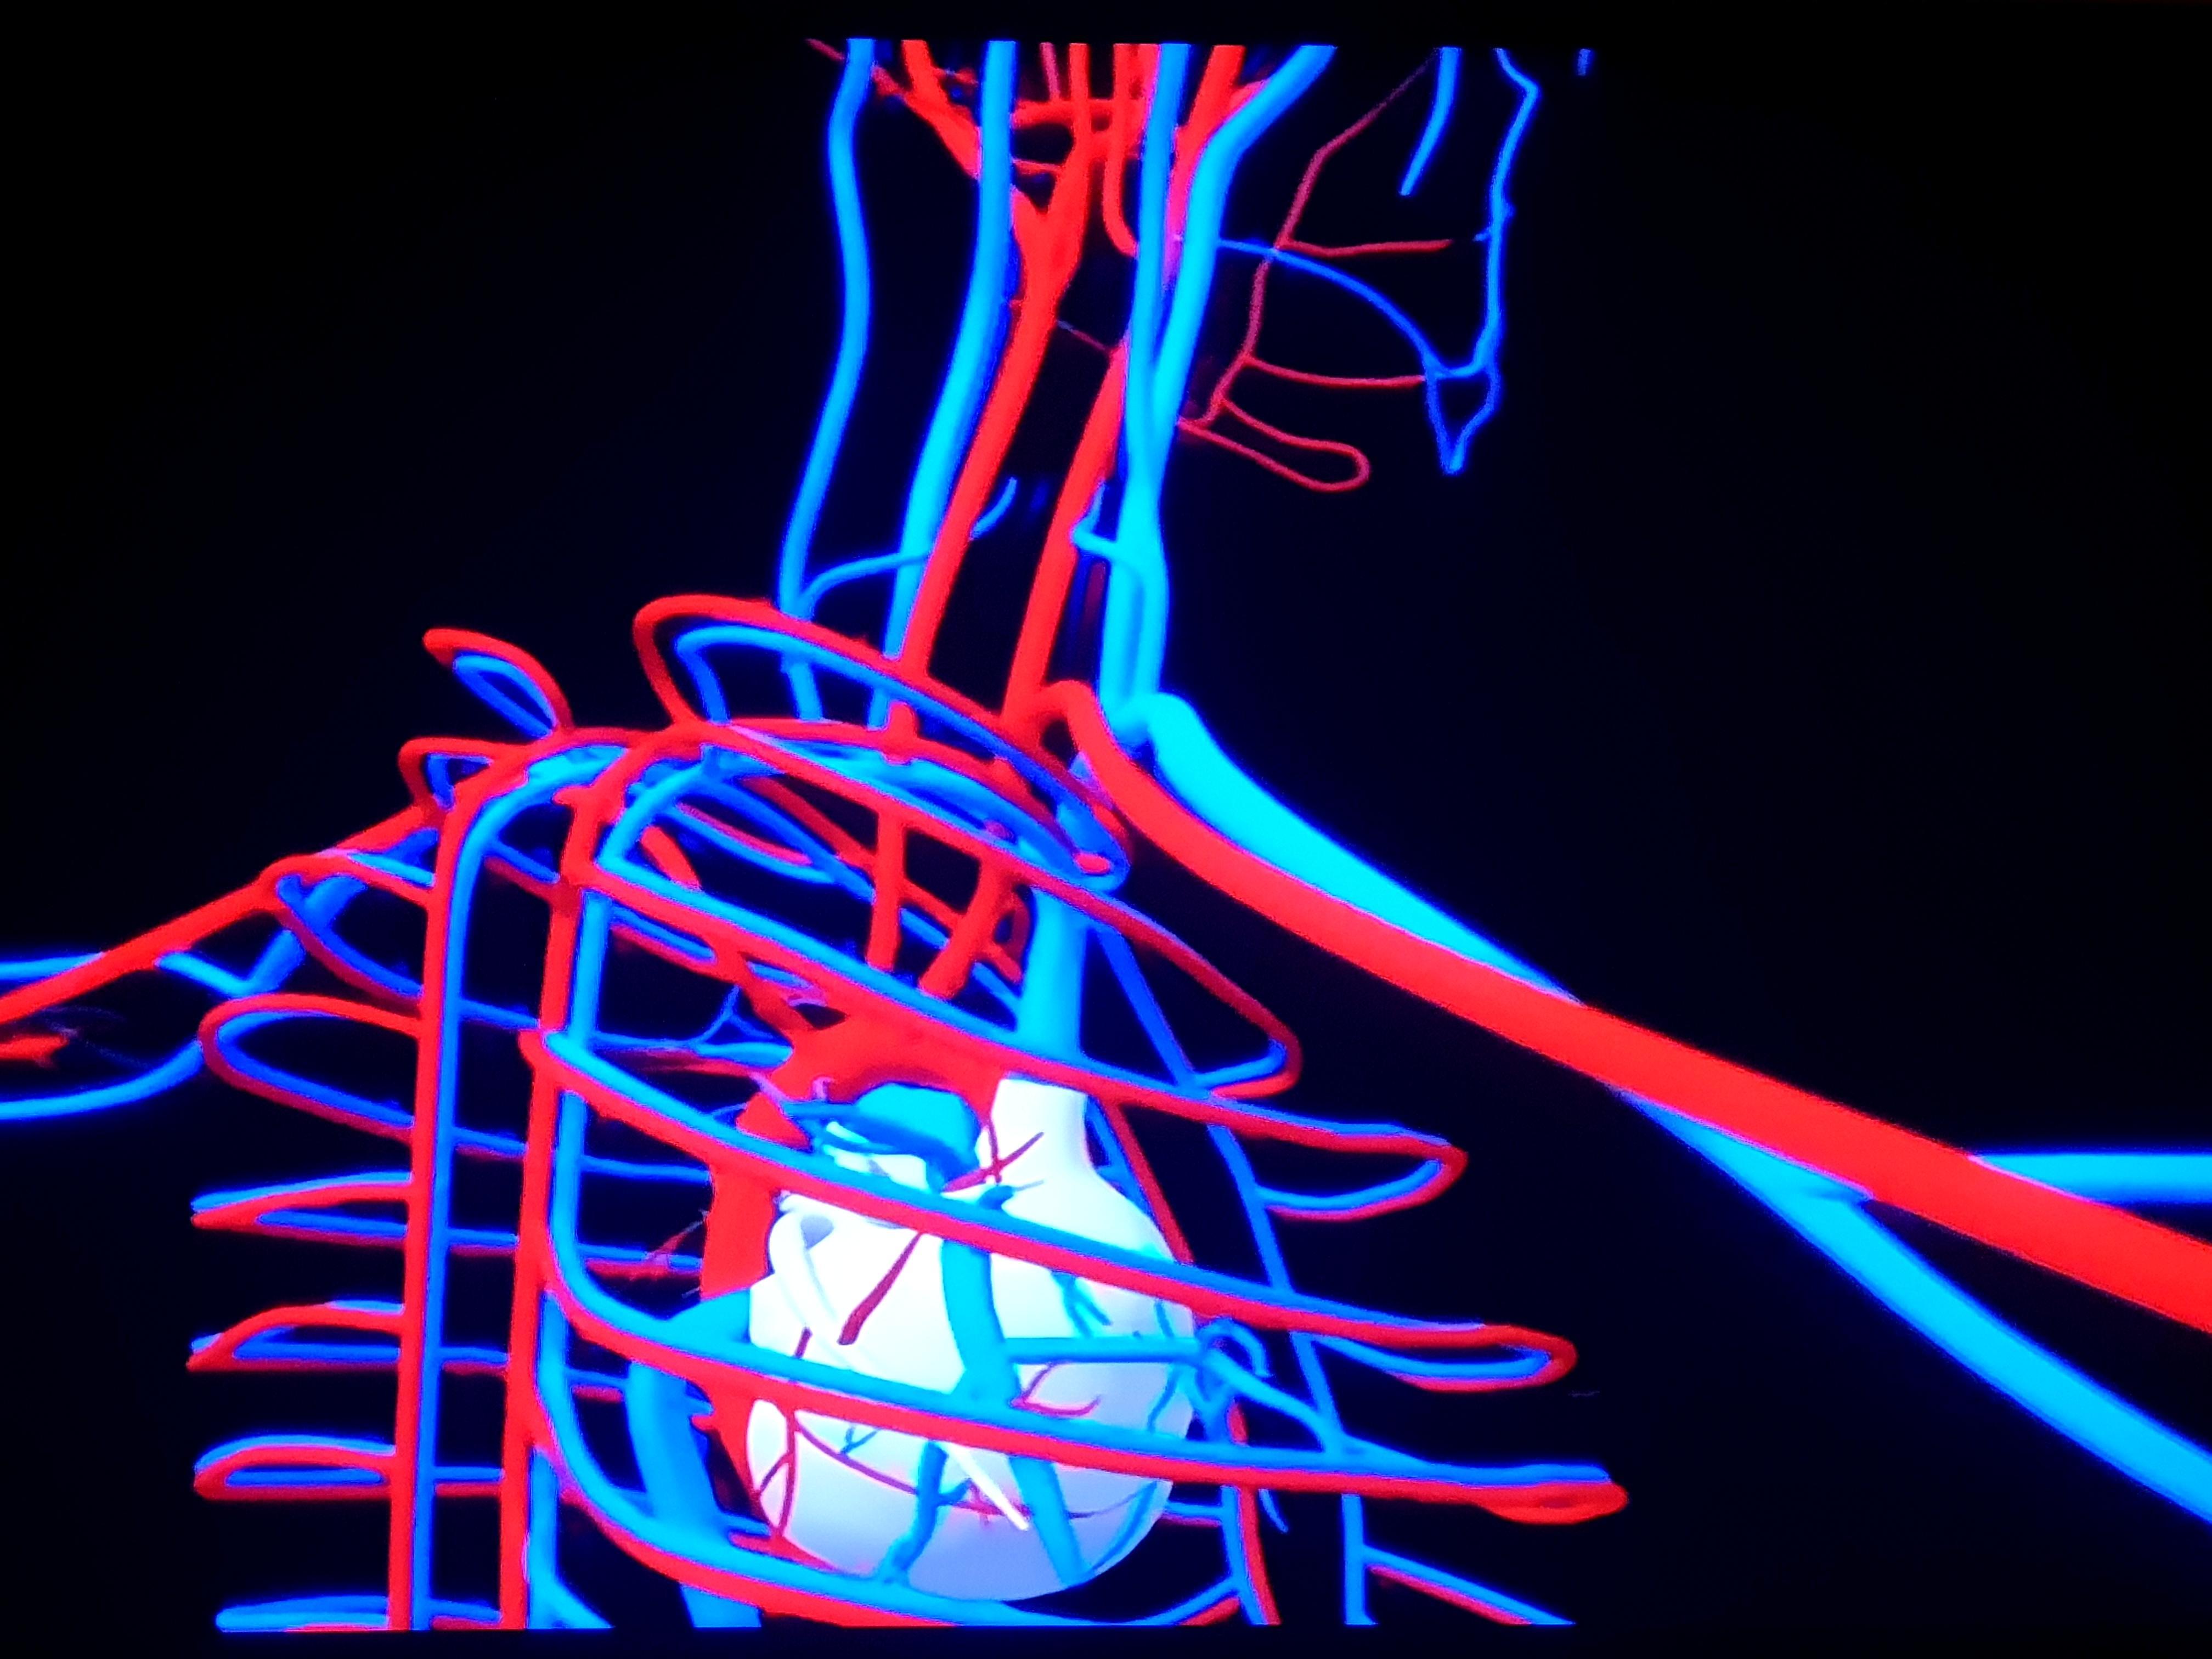 ea cons image 2 heart and ribs